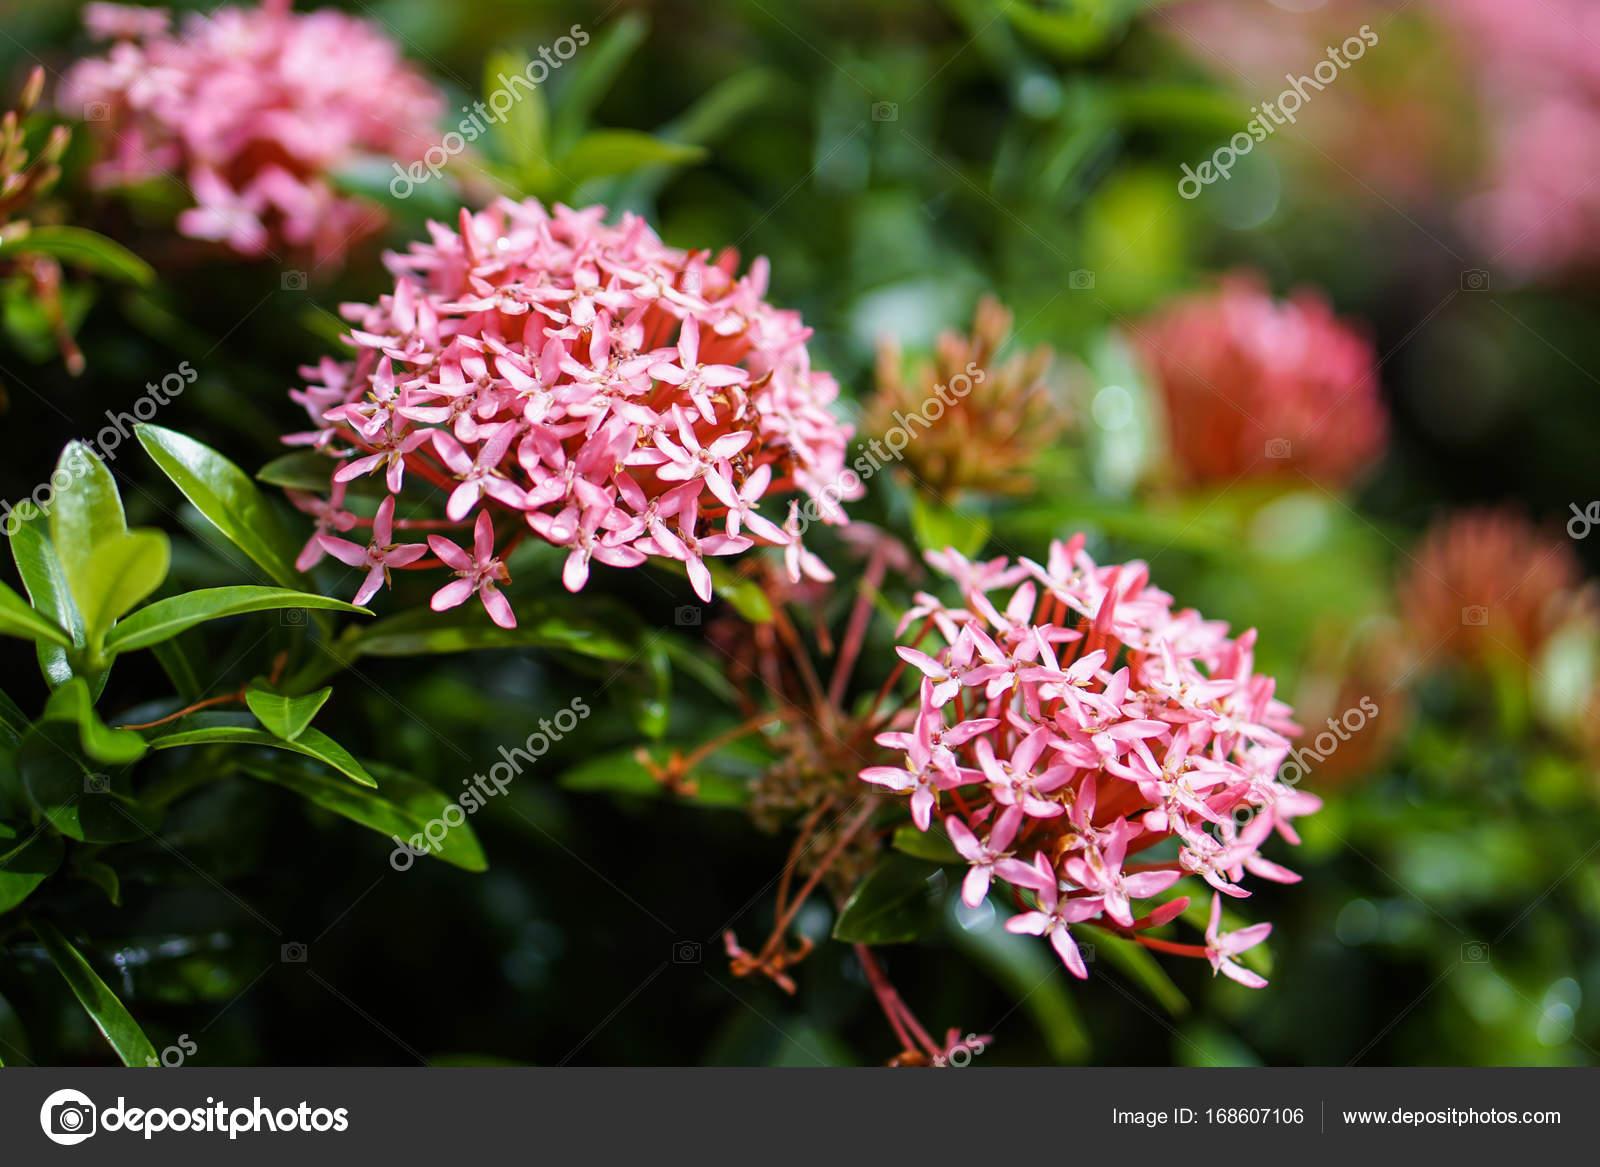 Red pink orange ixora spike flower green leaf rain drop stock red pink orange ixora spike flower green leaf rain drop stock photo mightylinksfo